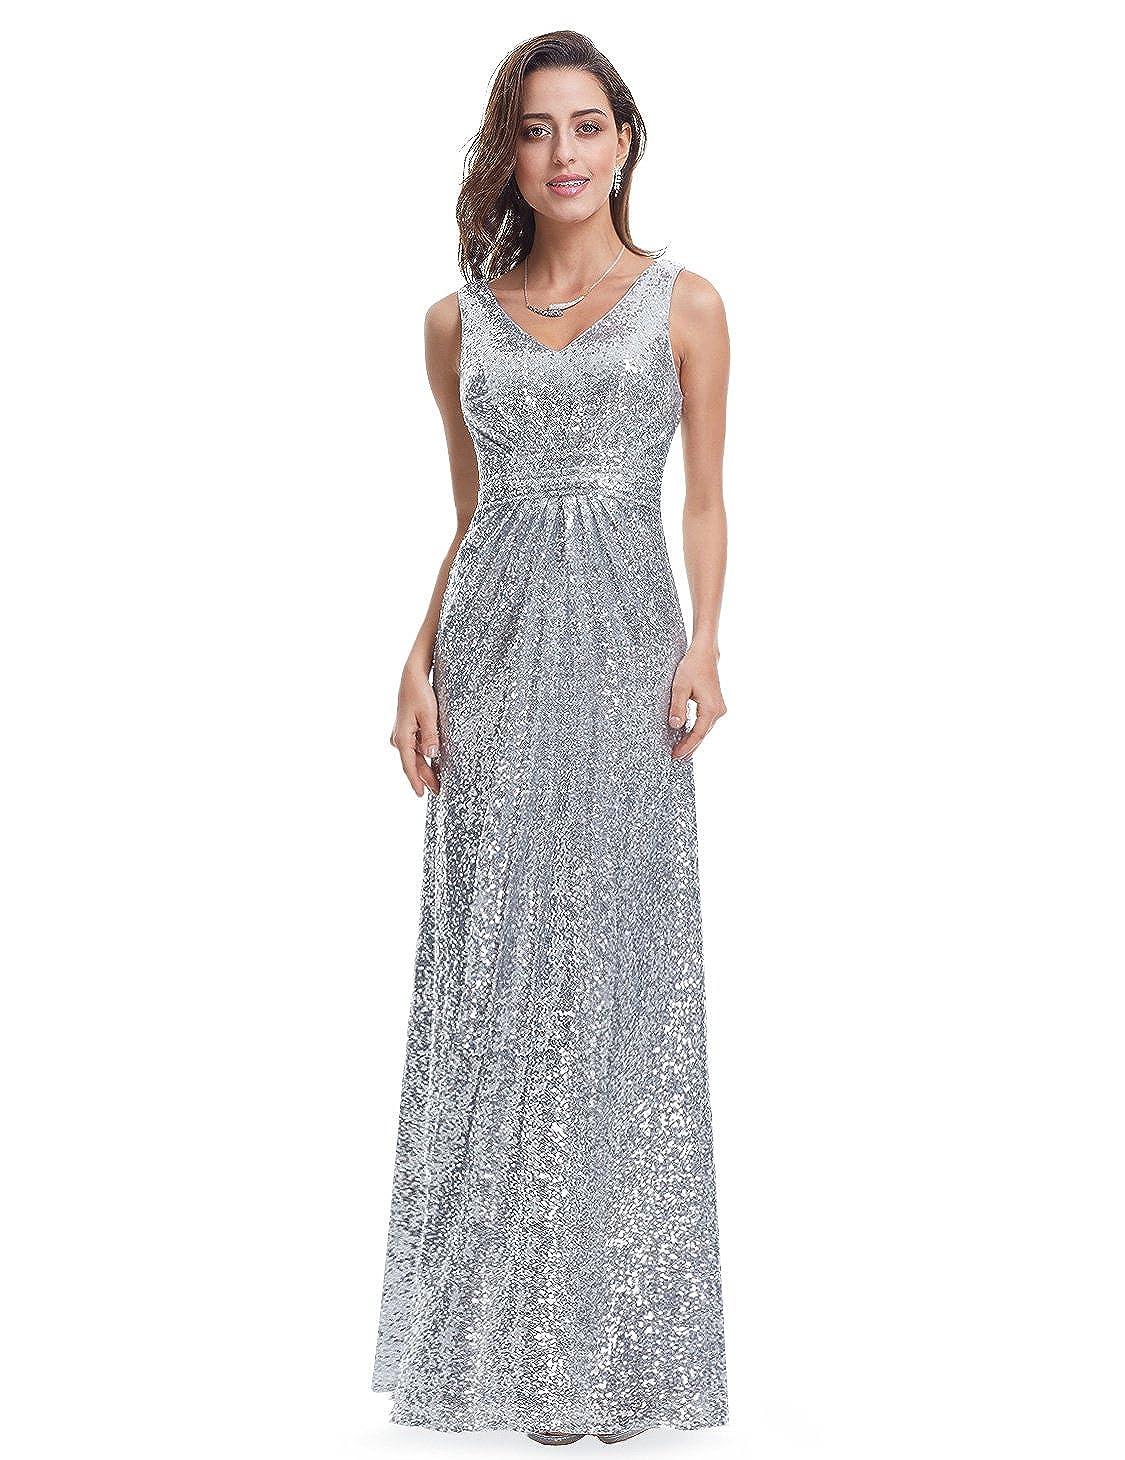 Amazon.com: Ever Pretty Double V-Neck Elegant Sequin Prom Gown ...